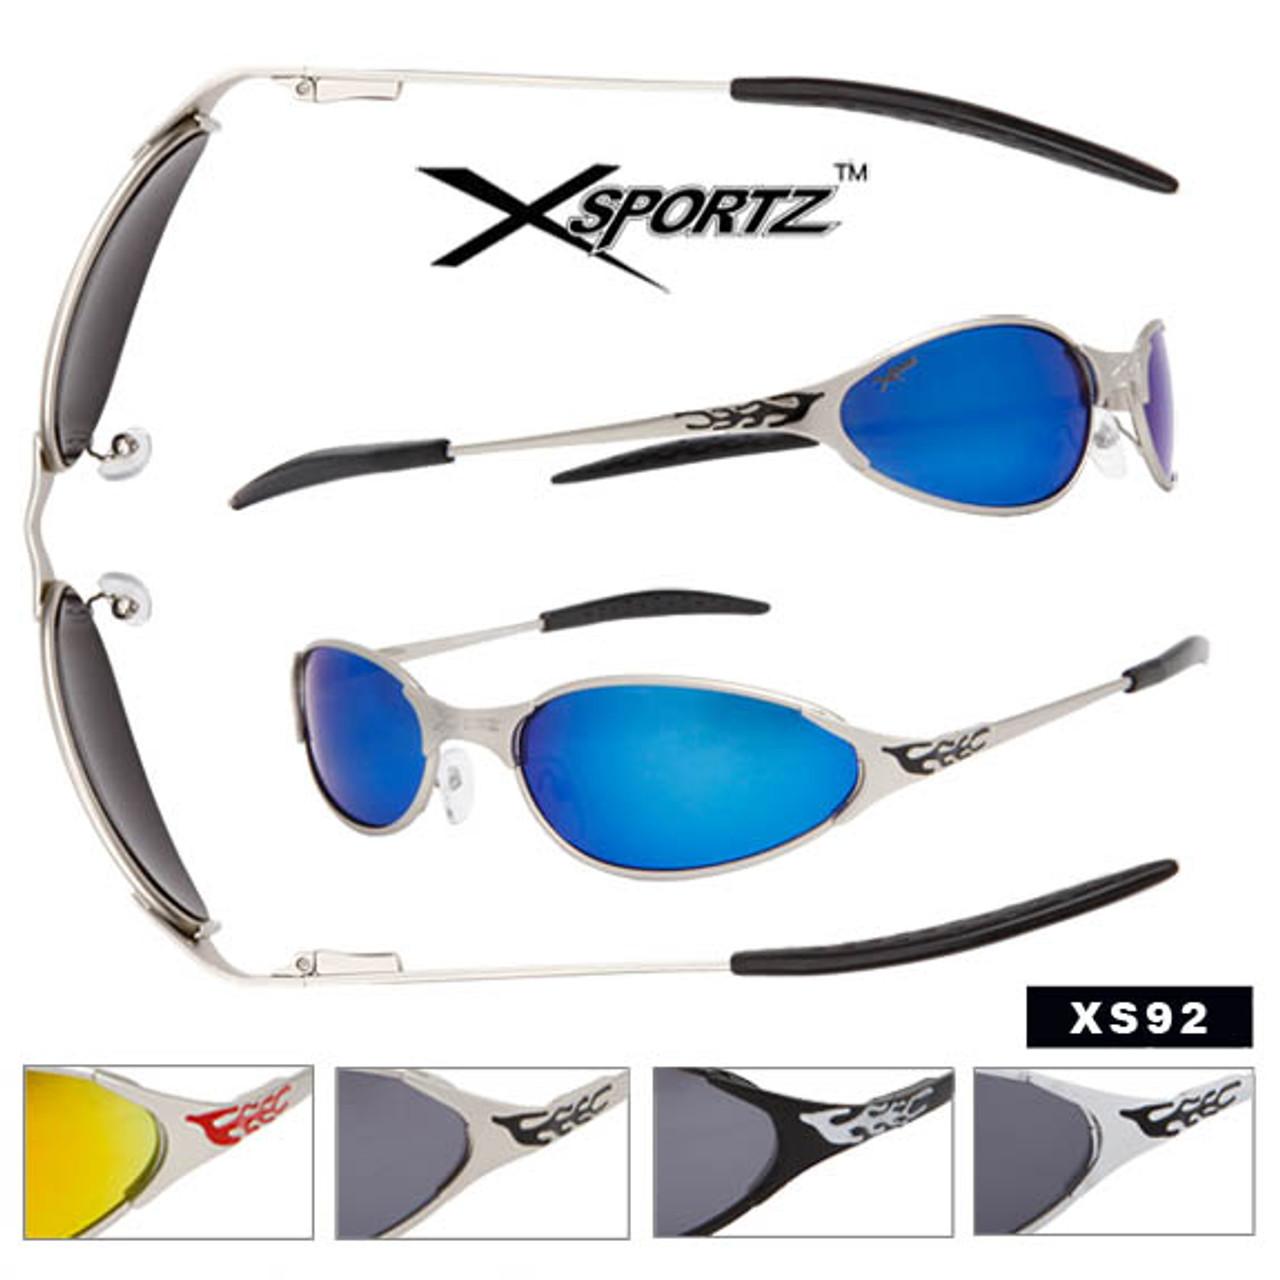 Flames Xsportz Sunglasses! XS92